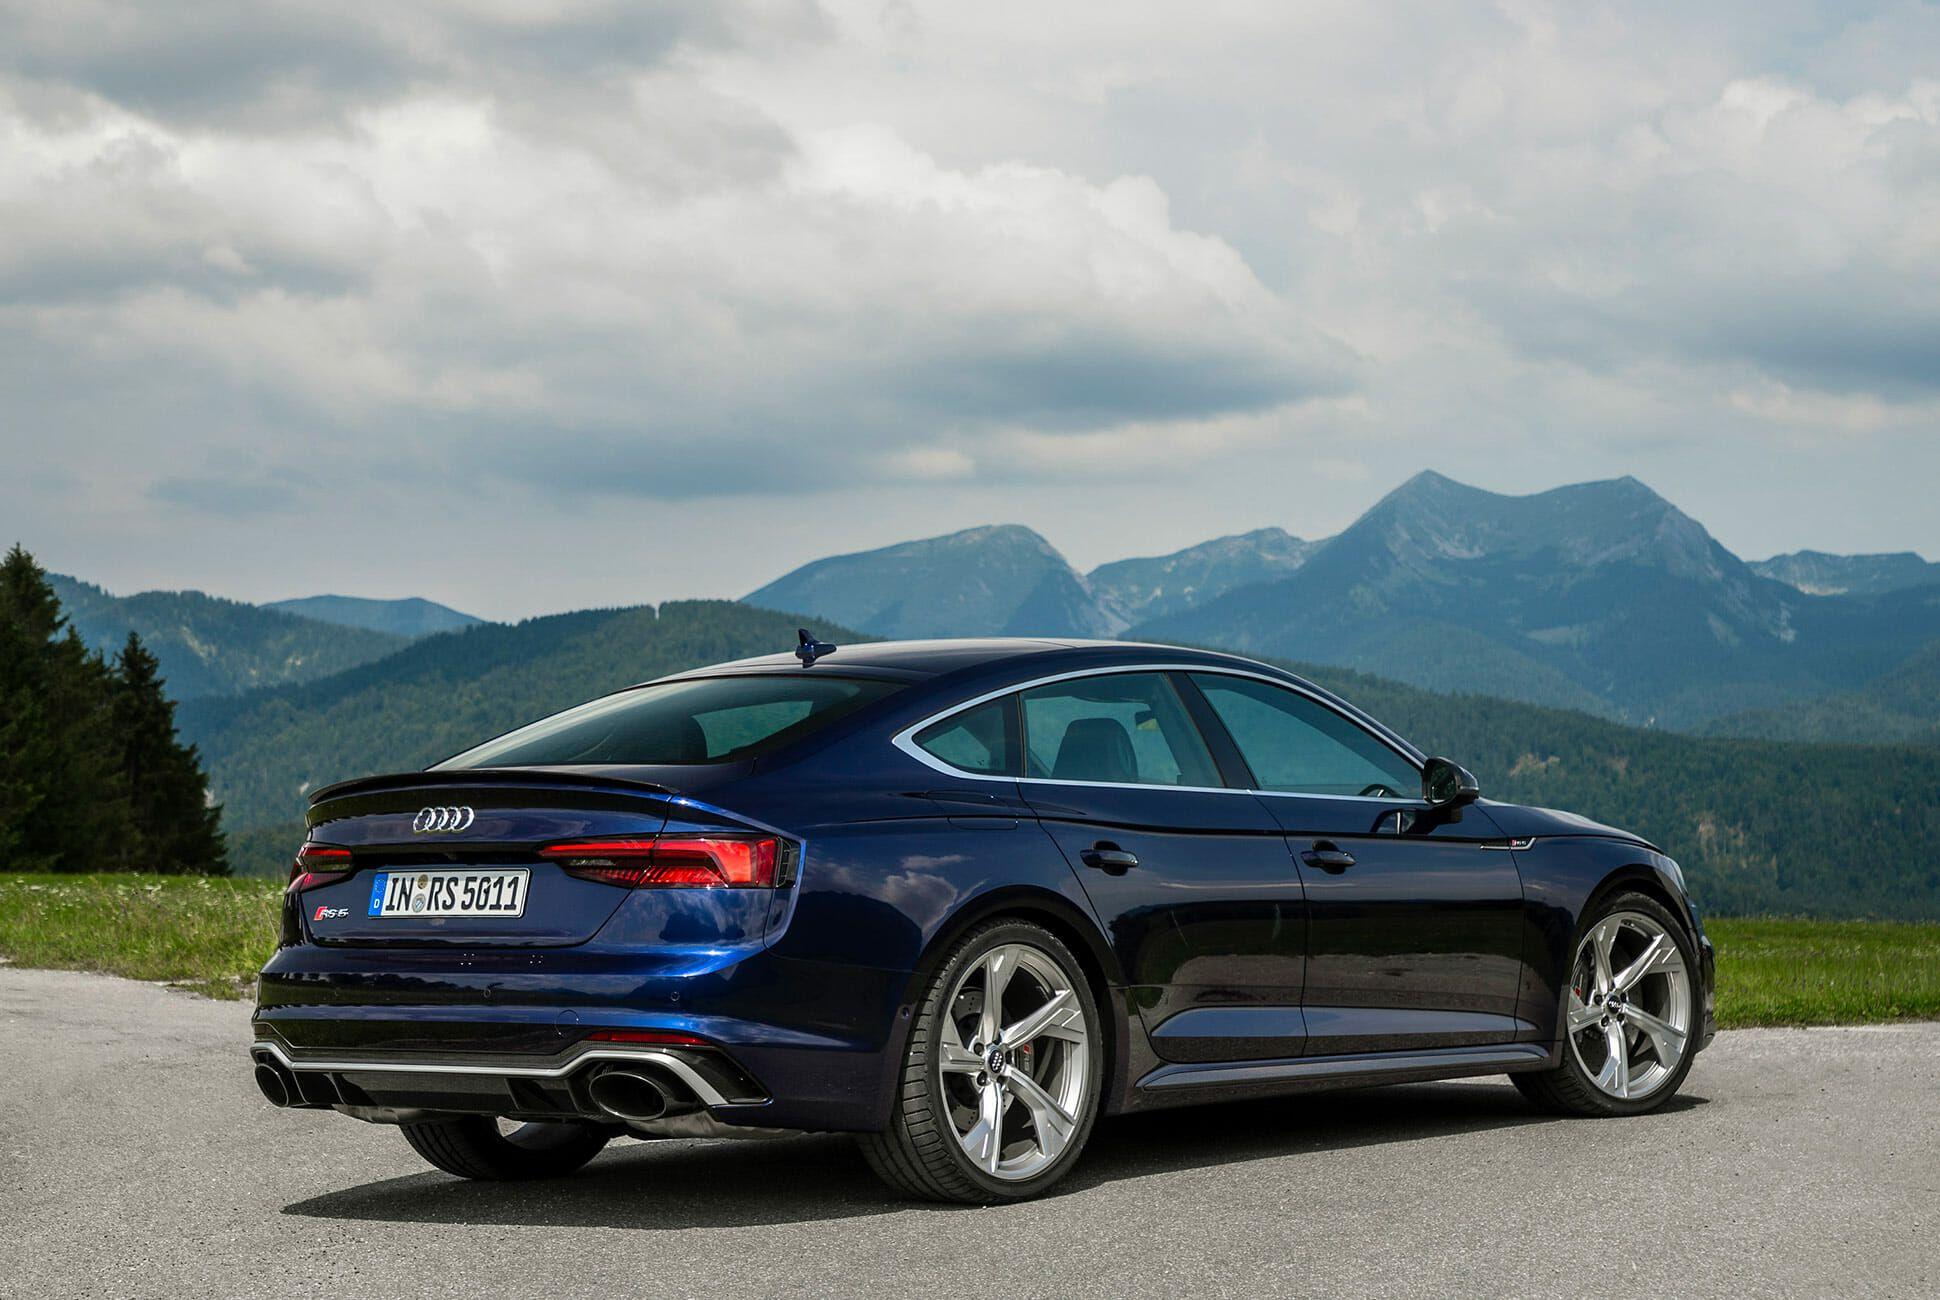 Audi-RS5-Sportback-Review-gear-patrol-slide-4